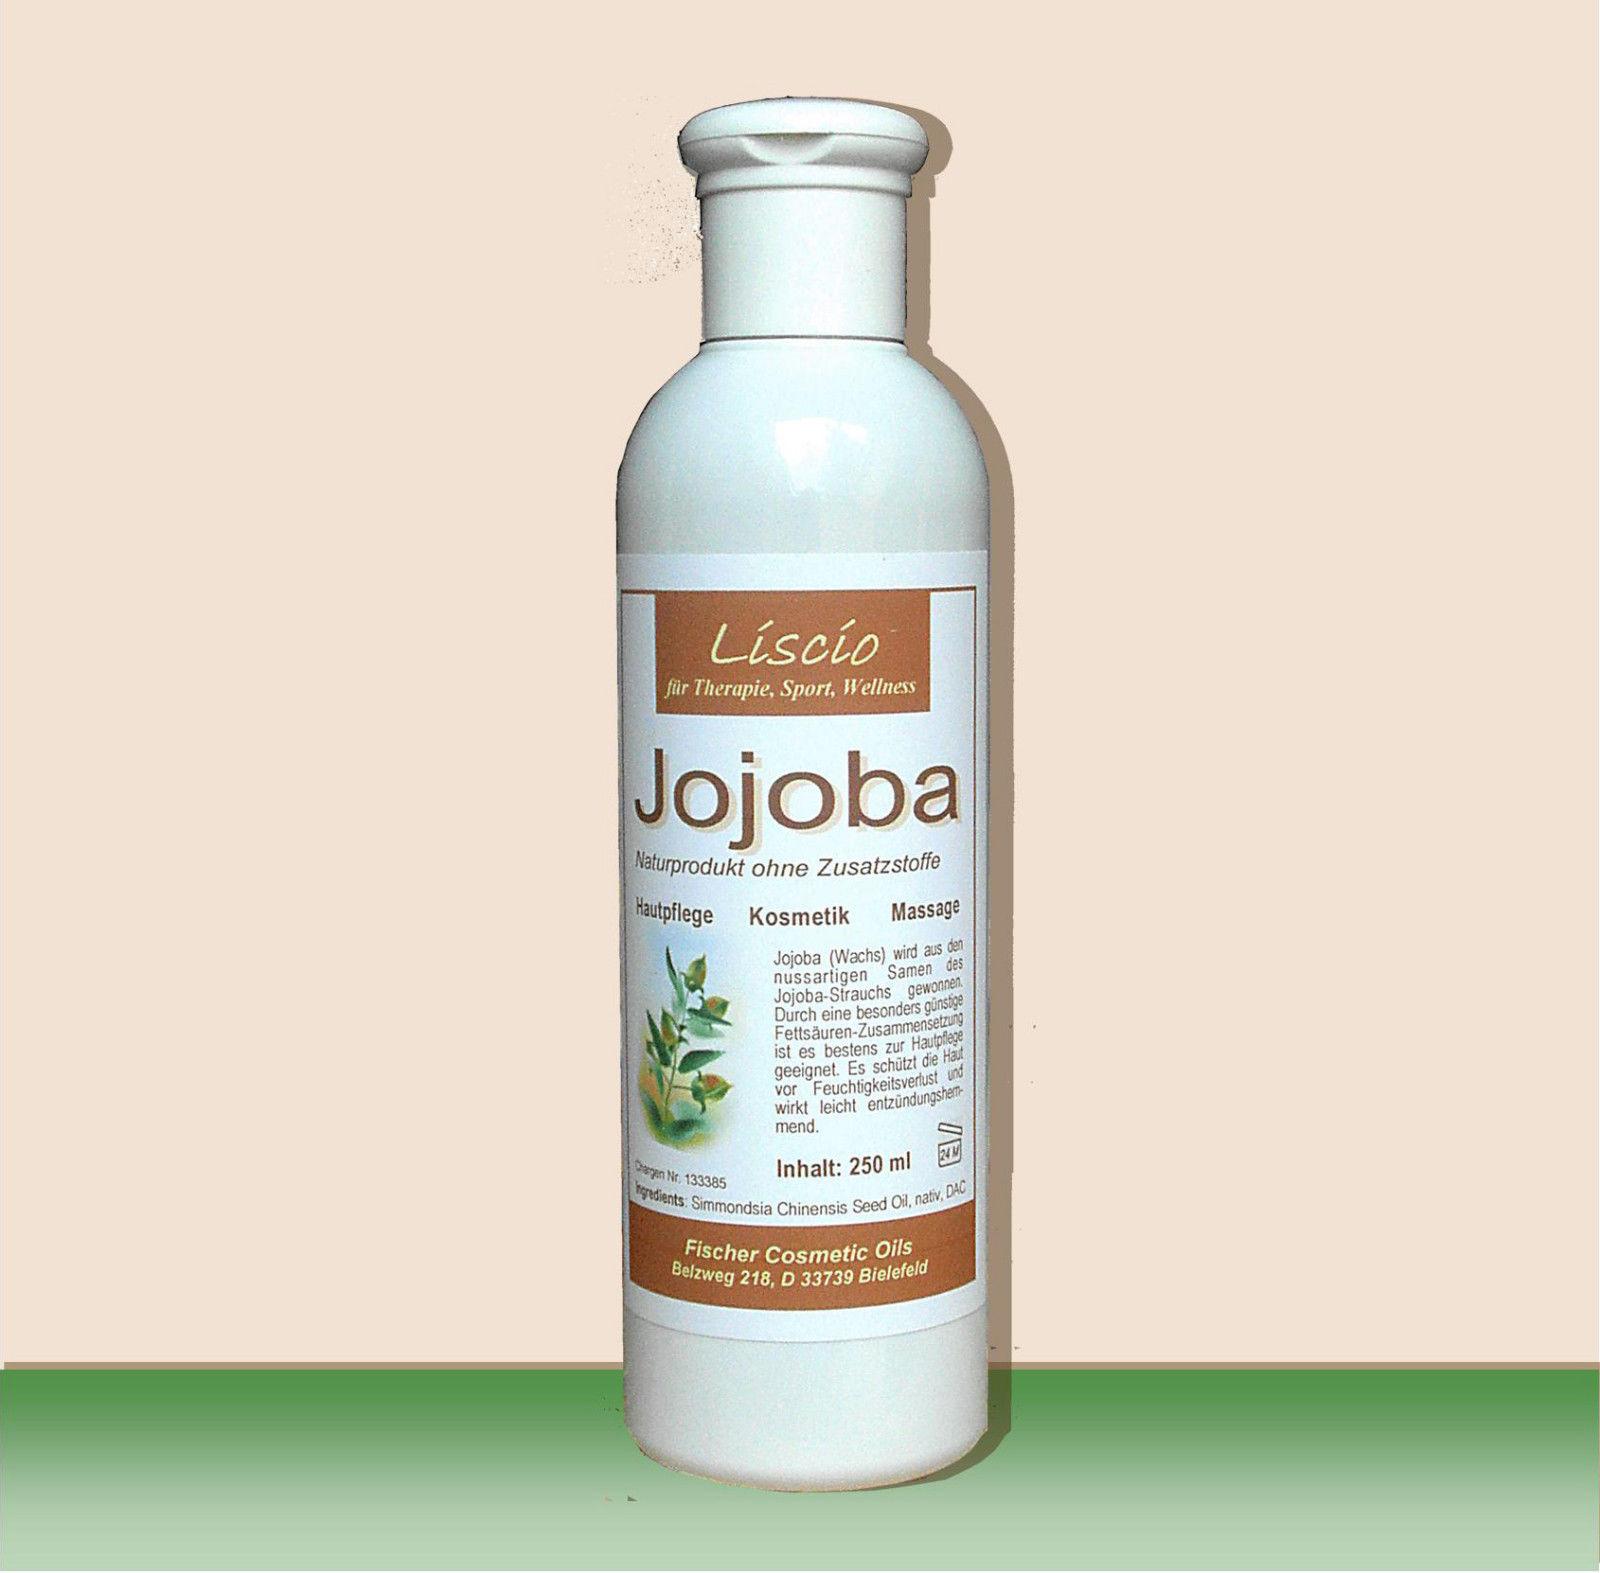 Jojoba Jojobaöl nativ kaltgepresst 250ml Naturprodukt in goldgelber DAC-Qualität